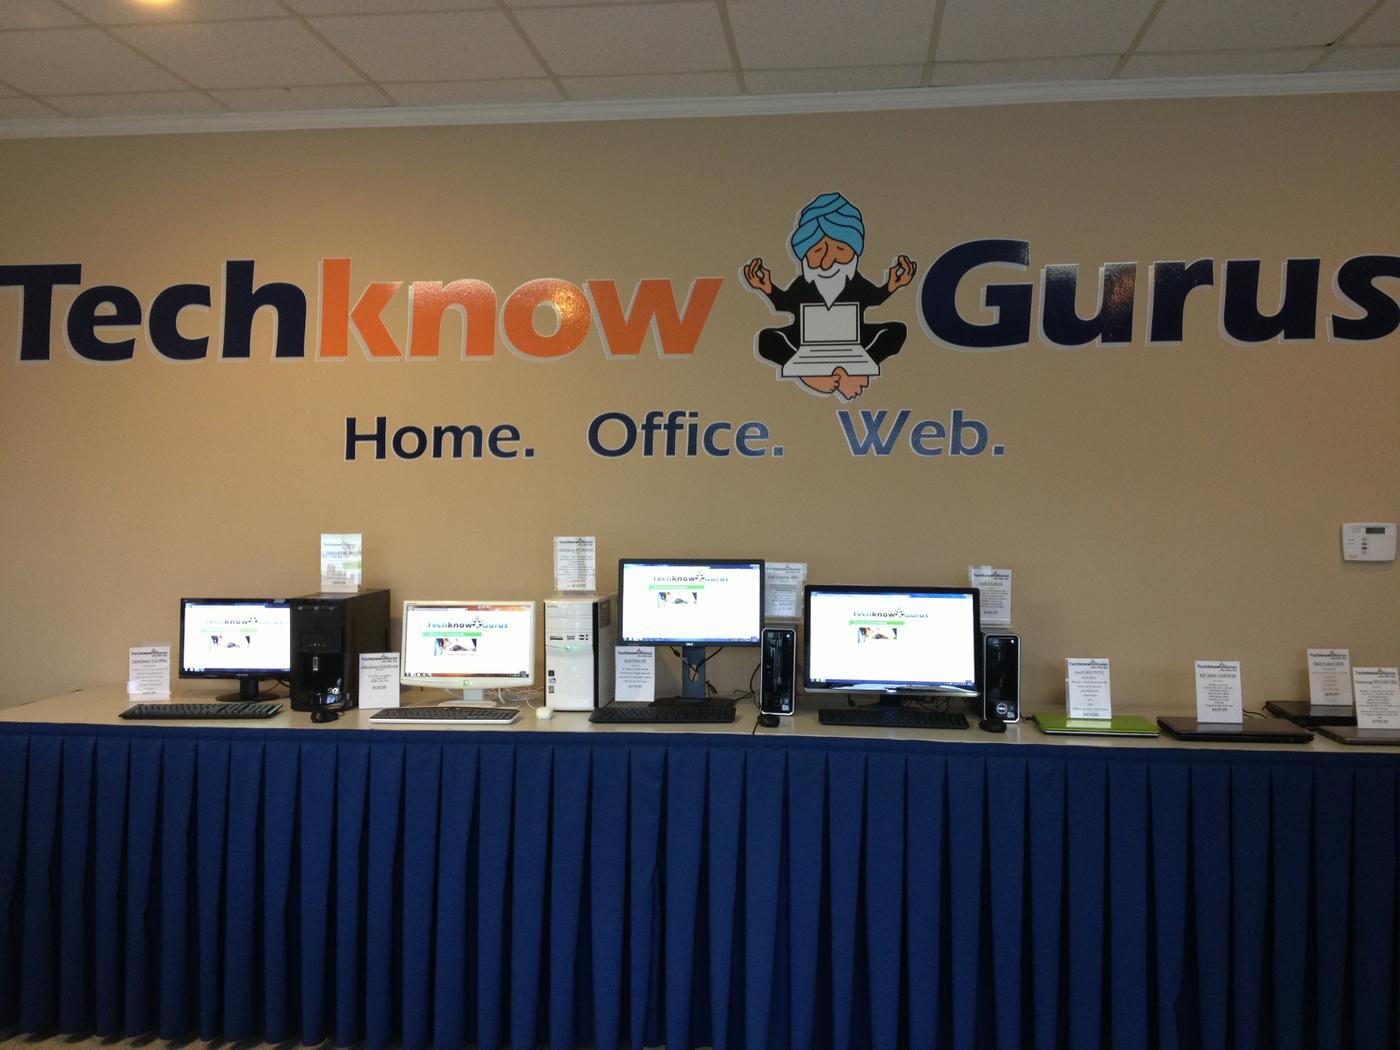 Techknow Gurus